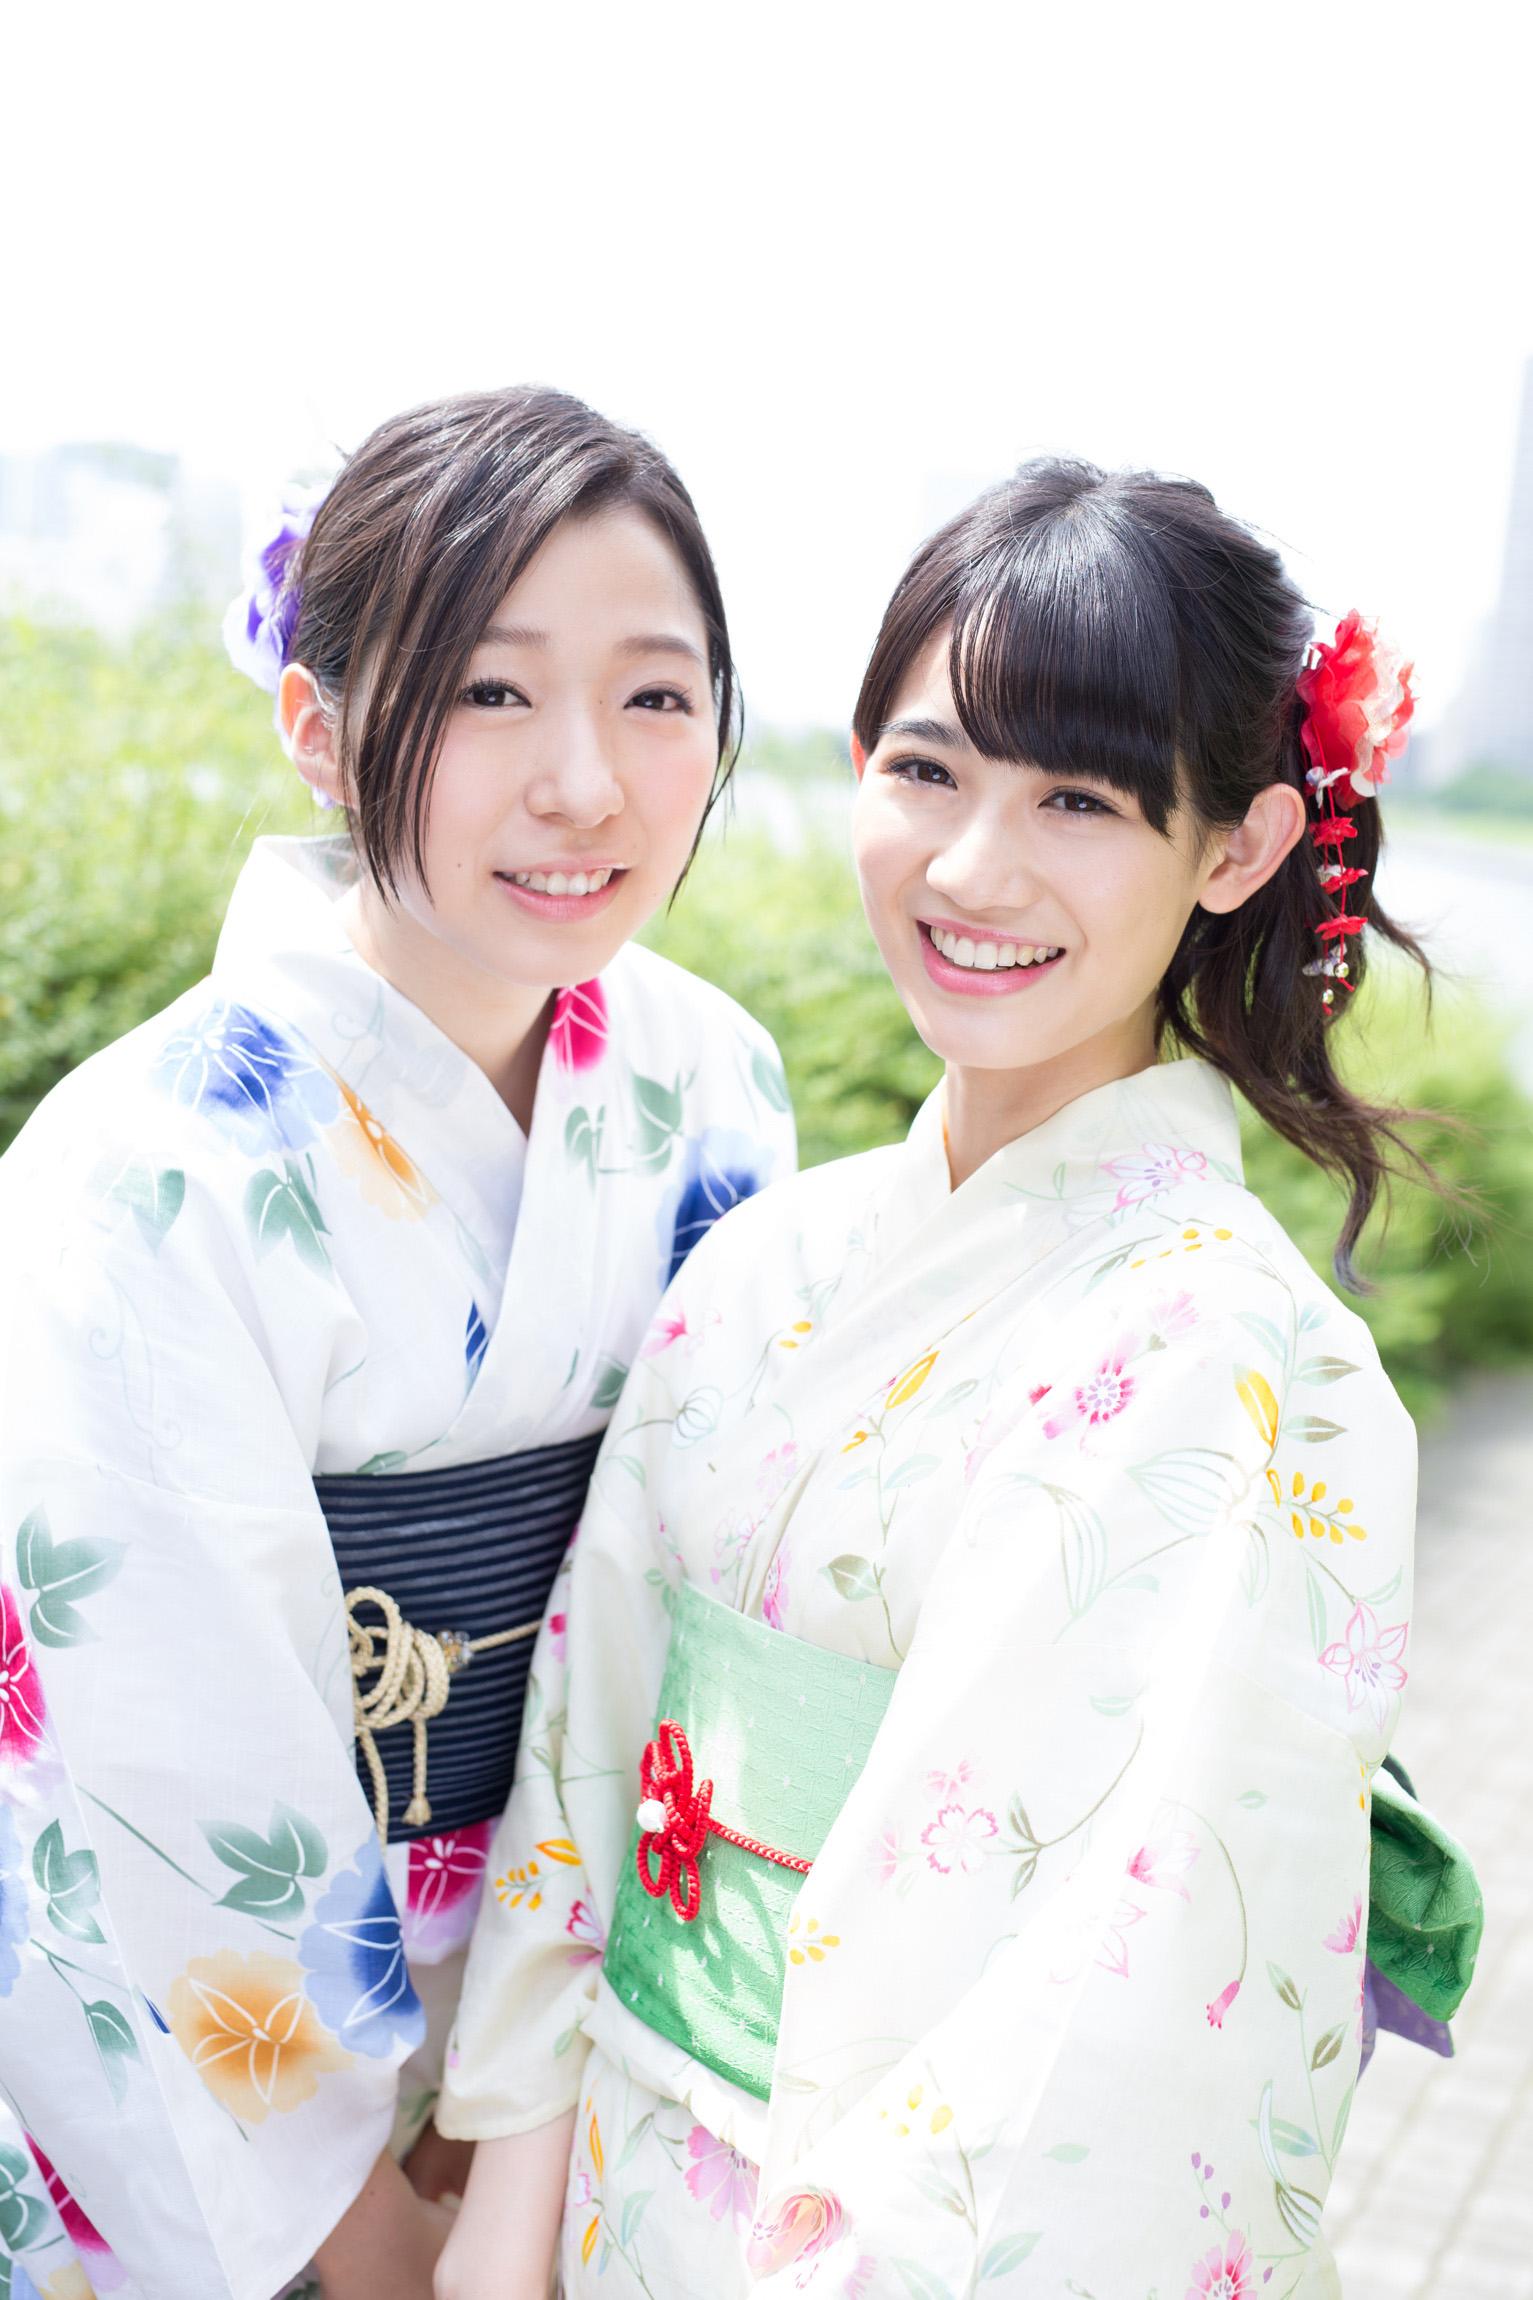 20160831_teamsyachihoko03_offshot_toukou